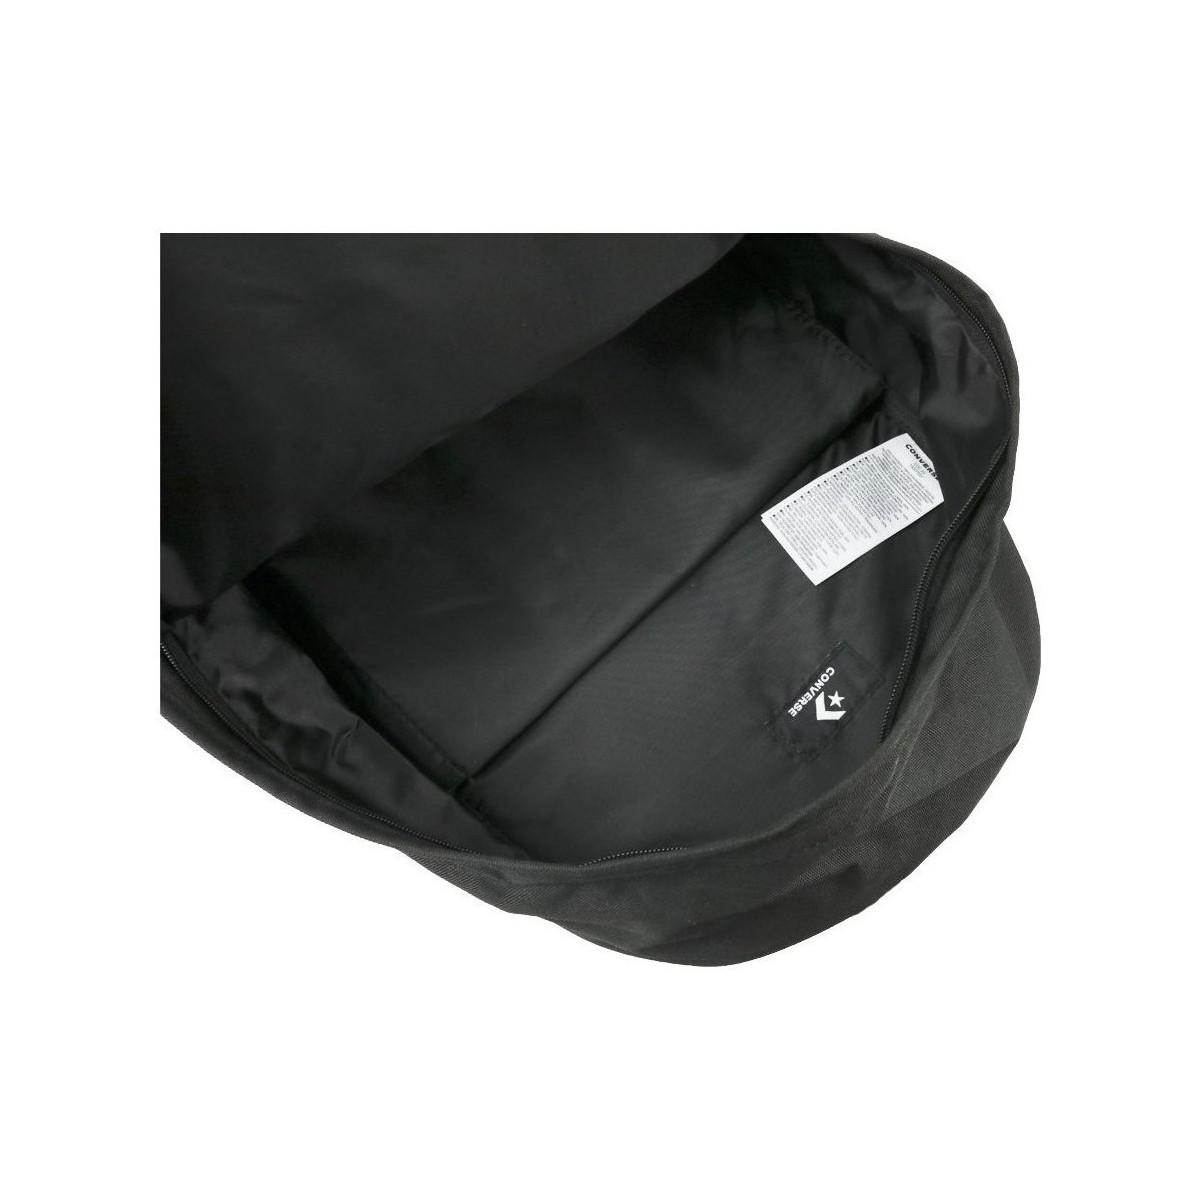 1e82f0f5b02 Converse Edc 22 Backpack Women s Backpack In Black in Black for Men ...